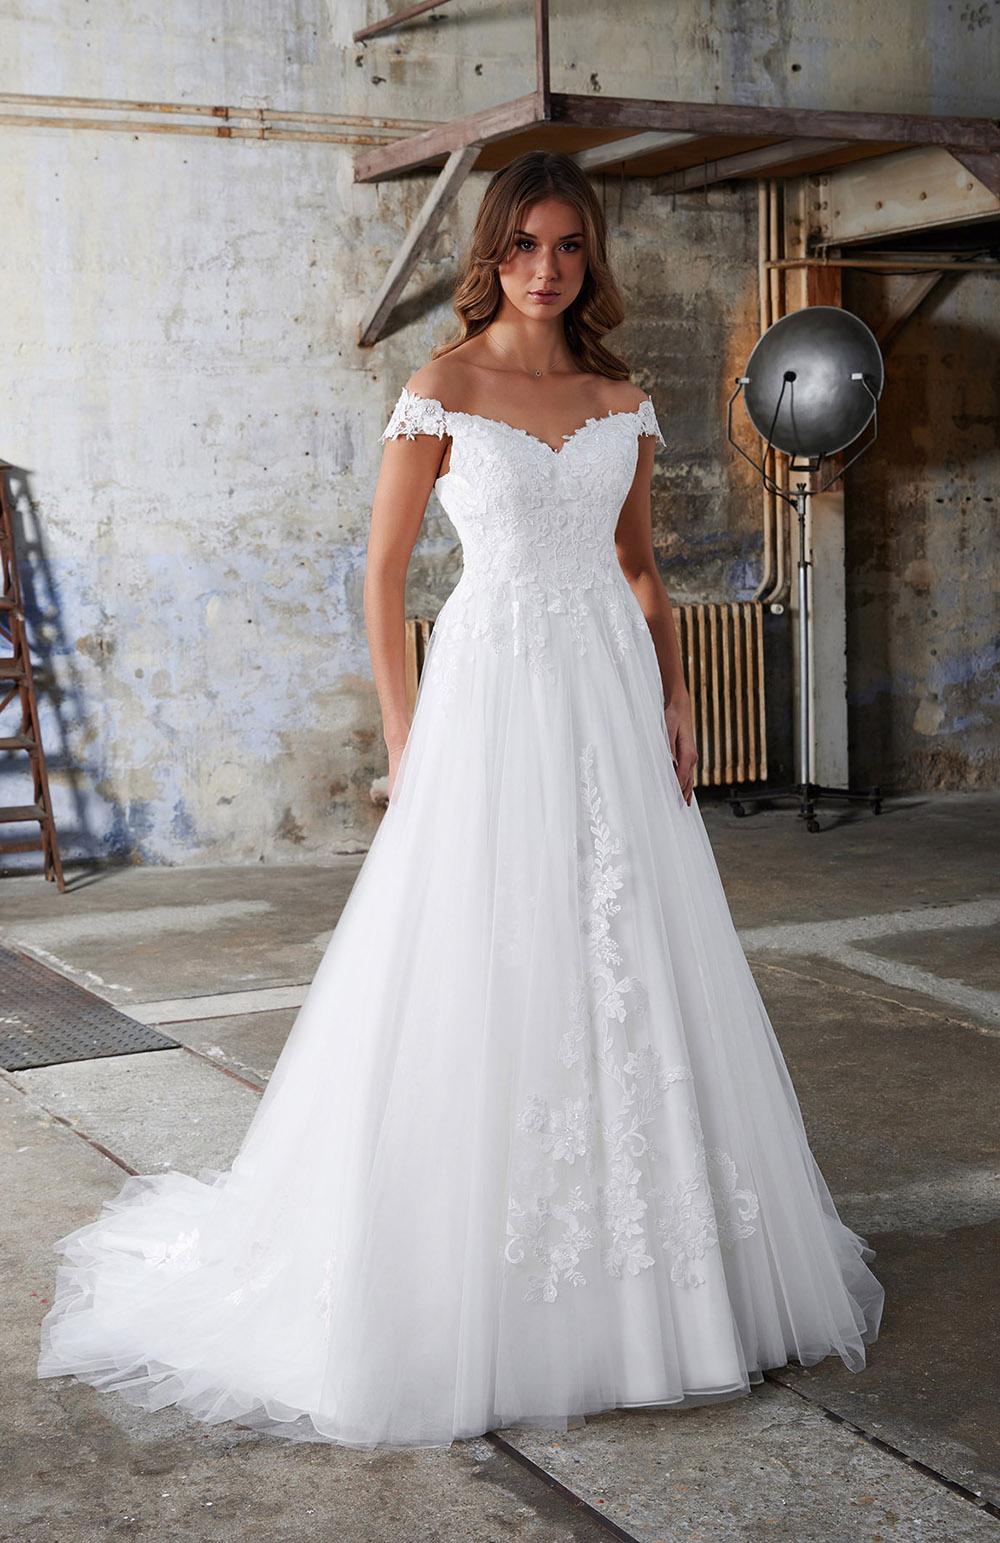 Robe de mariée Modèle Jilly